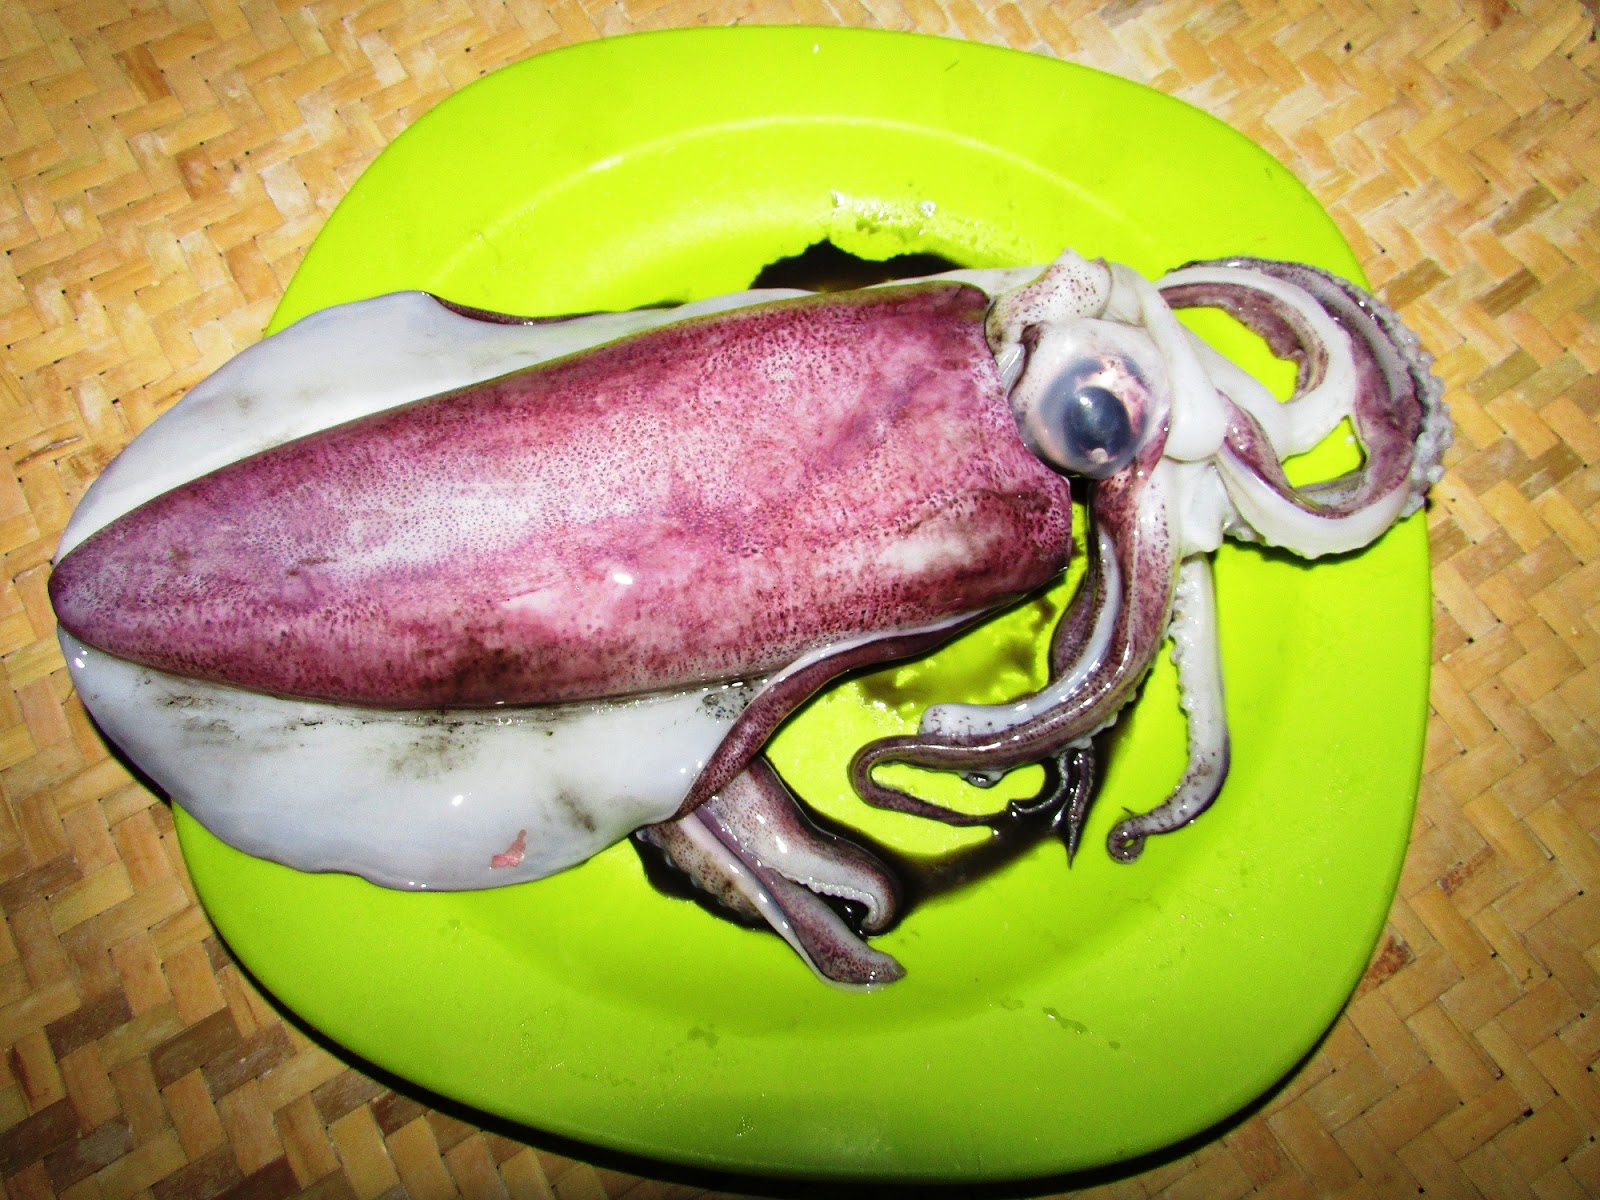 Cumi-cumi (Moluska Cephalopoda)